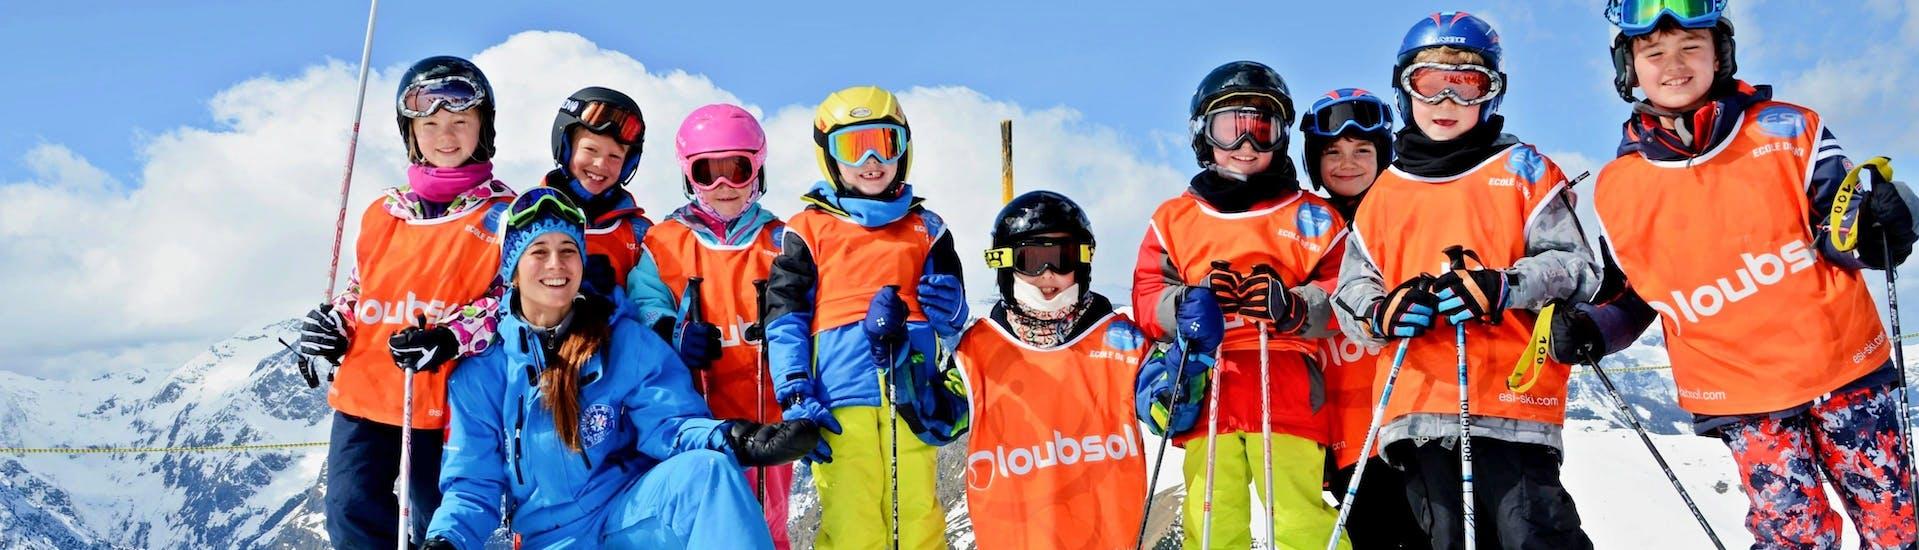 kids-ski-lessons-4-12-years-all-levels-low-season-european-ski-school-hero